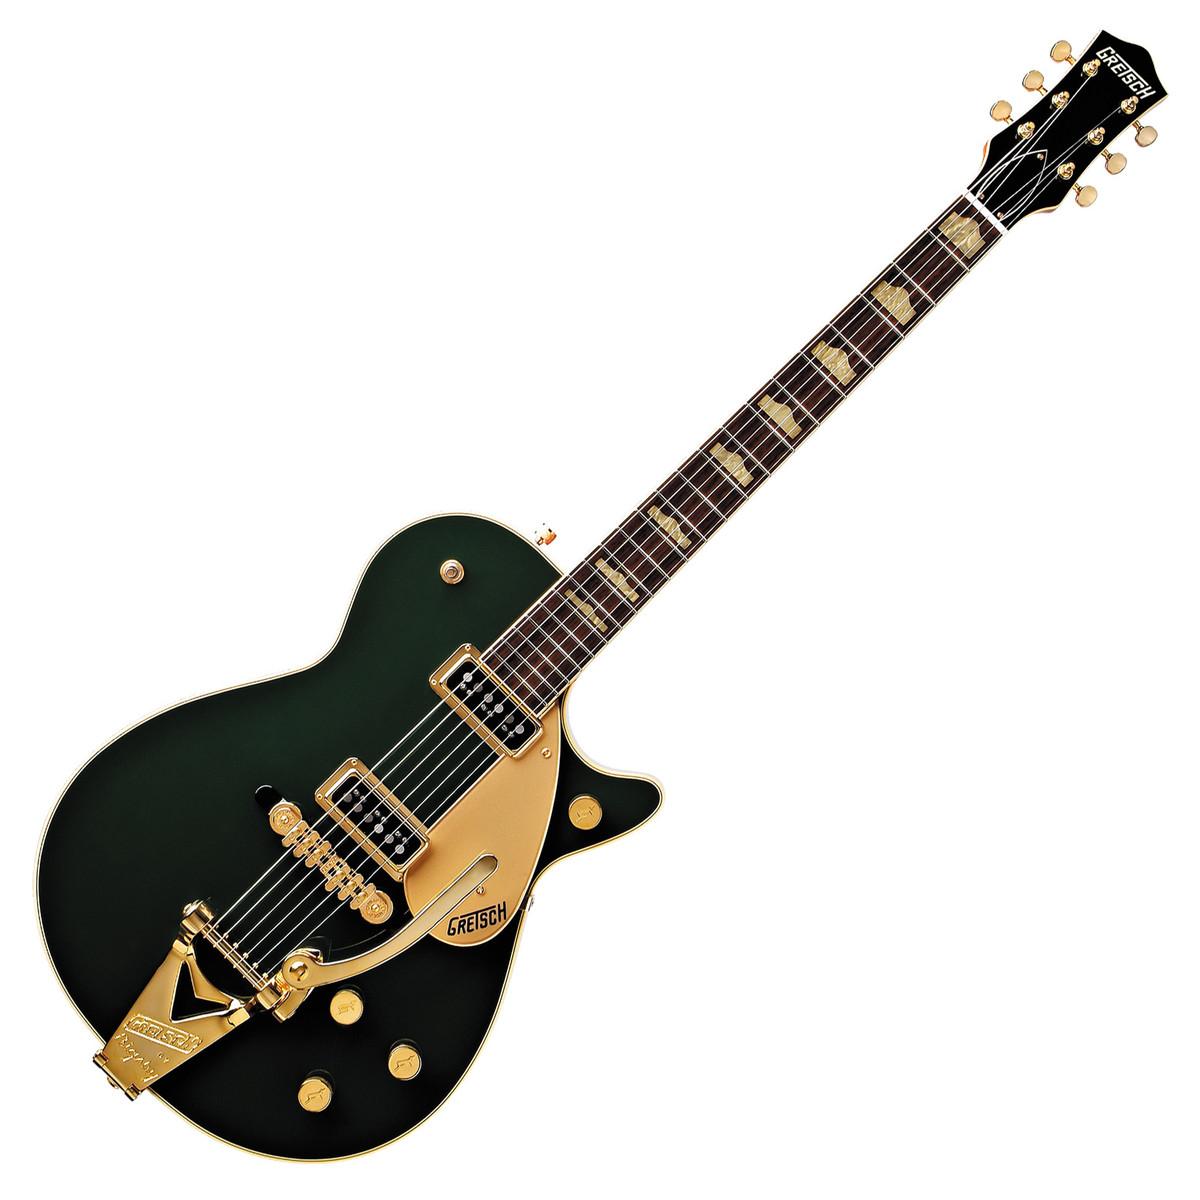 6c32e3c4d74 DISC Gretsch G6128TCG Duo Jet Electric Guitar, Cadillac Green at ...